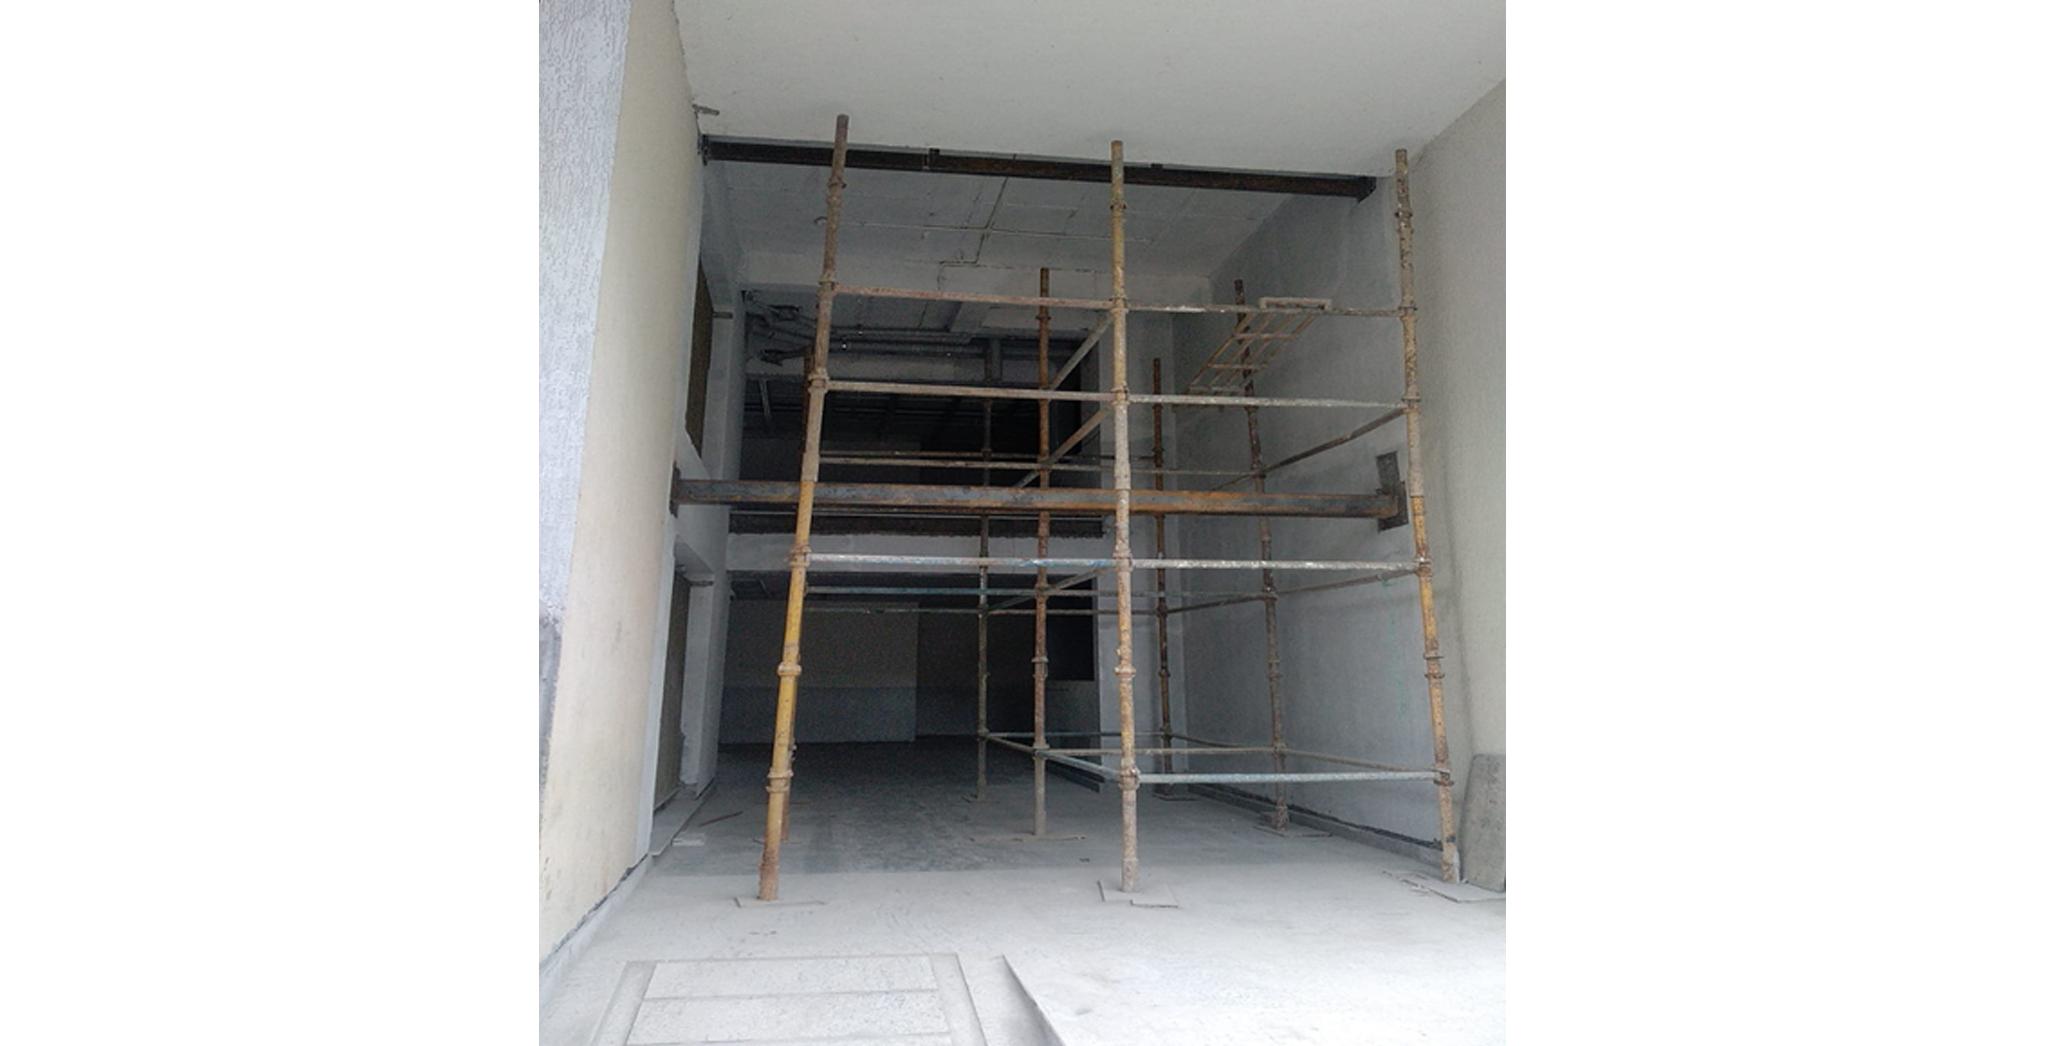 Aug 2021 - E Block: Tower Entrance works in progress